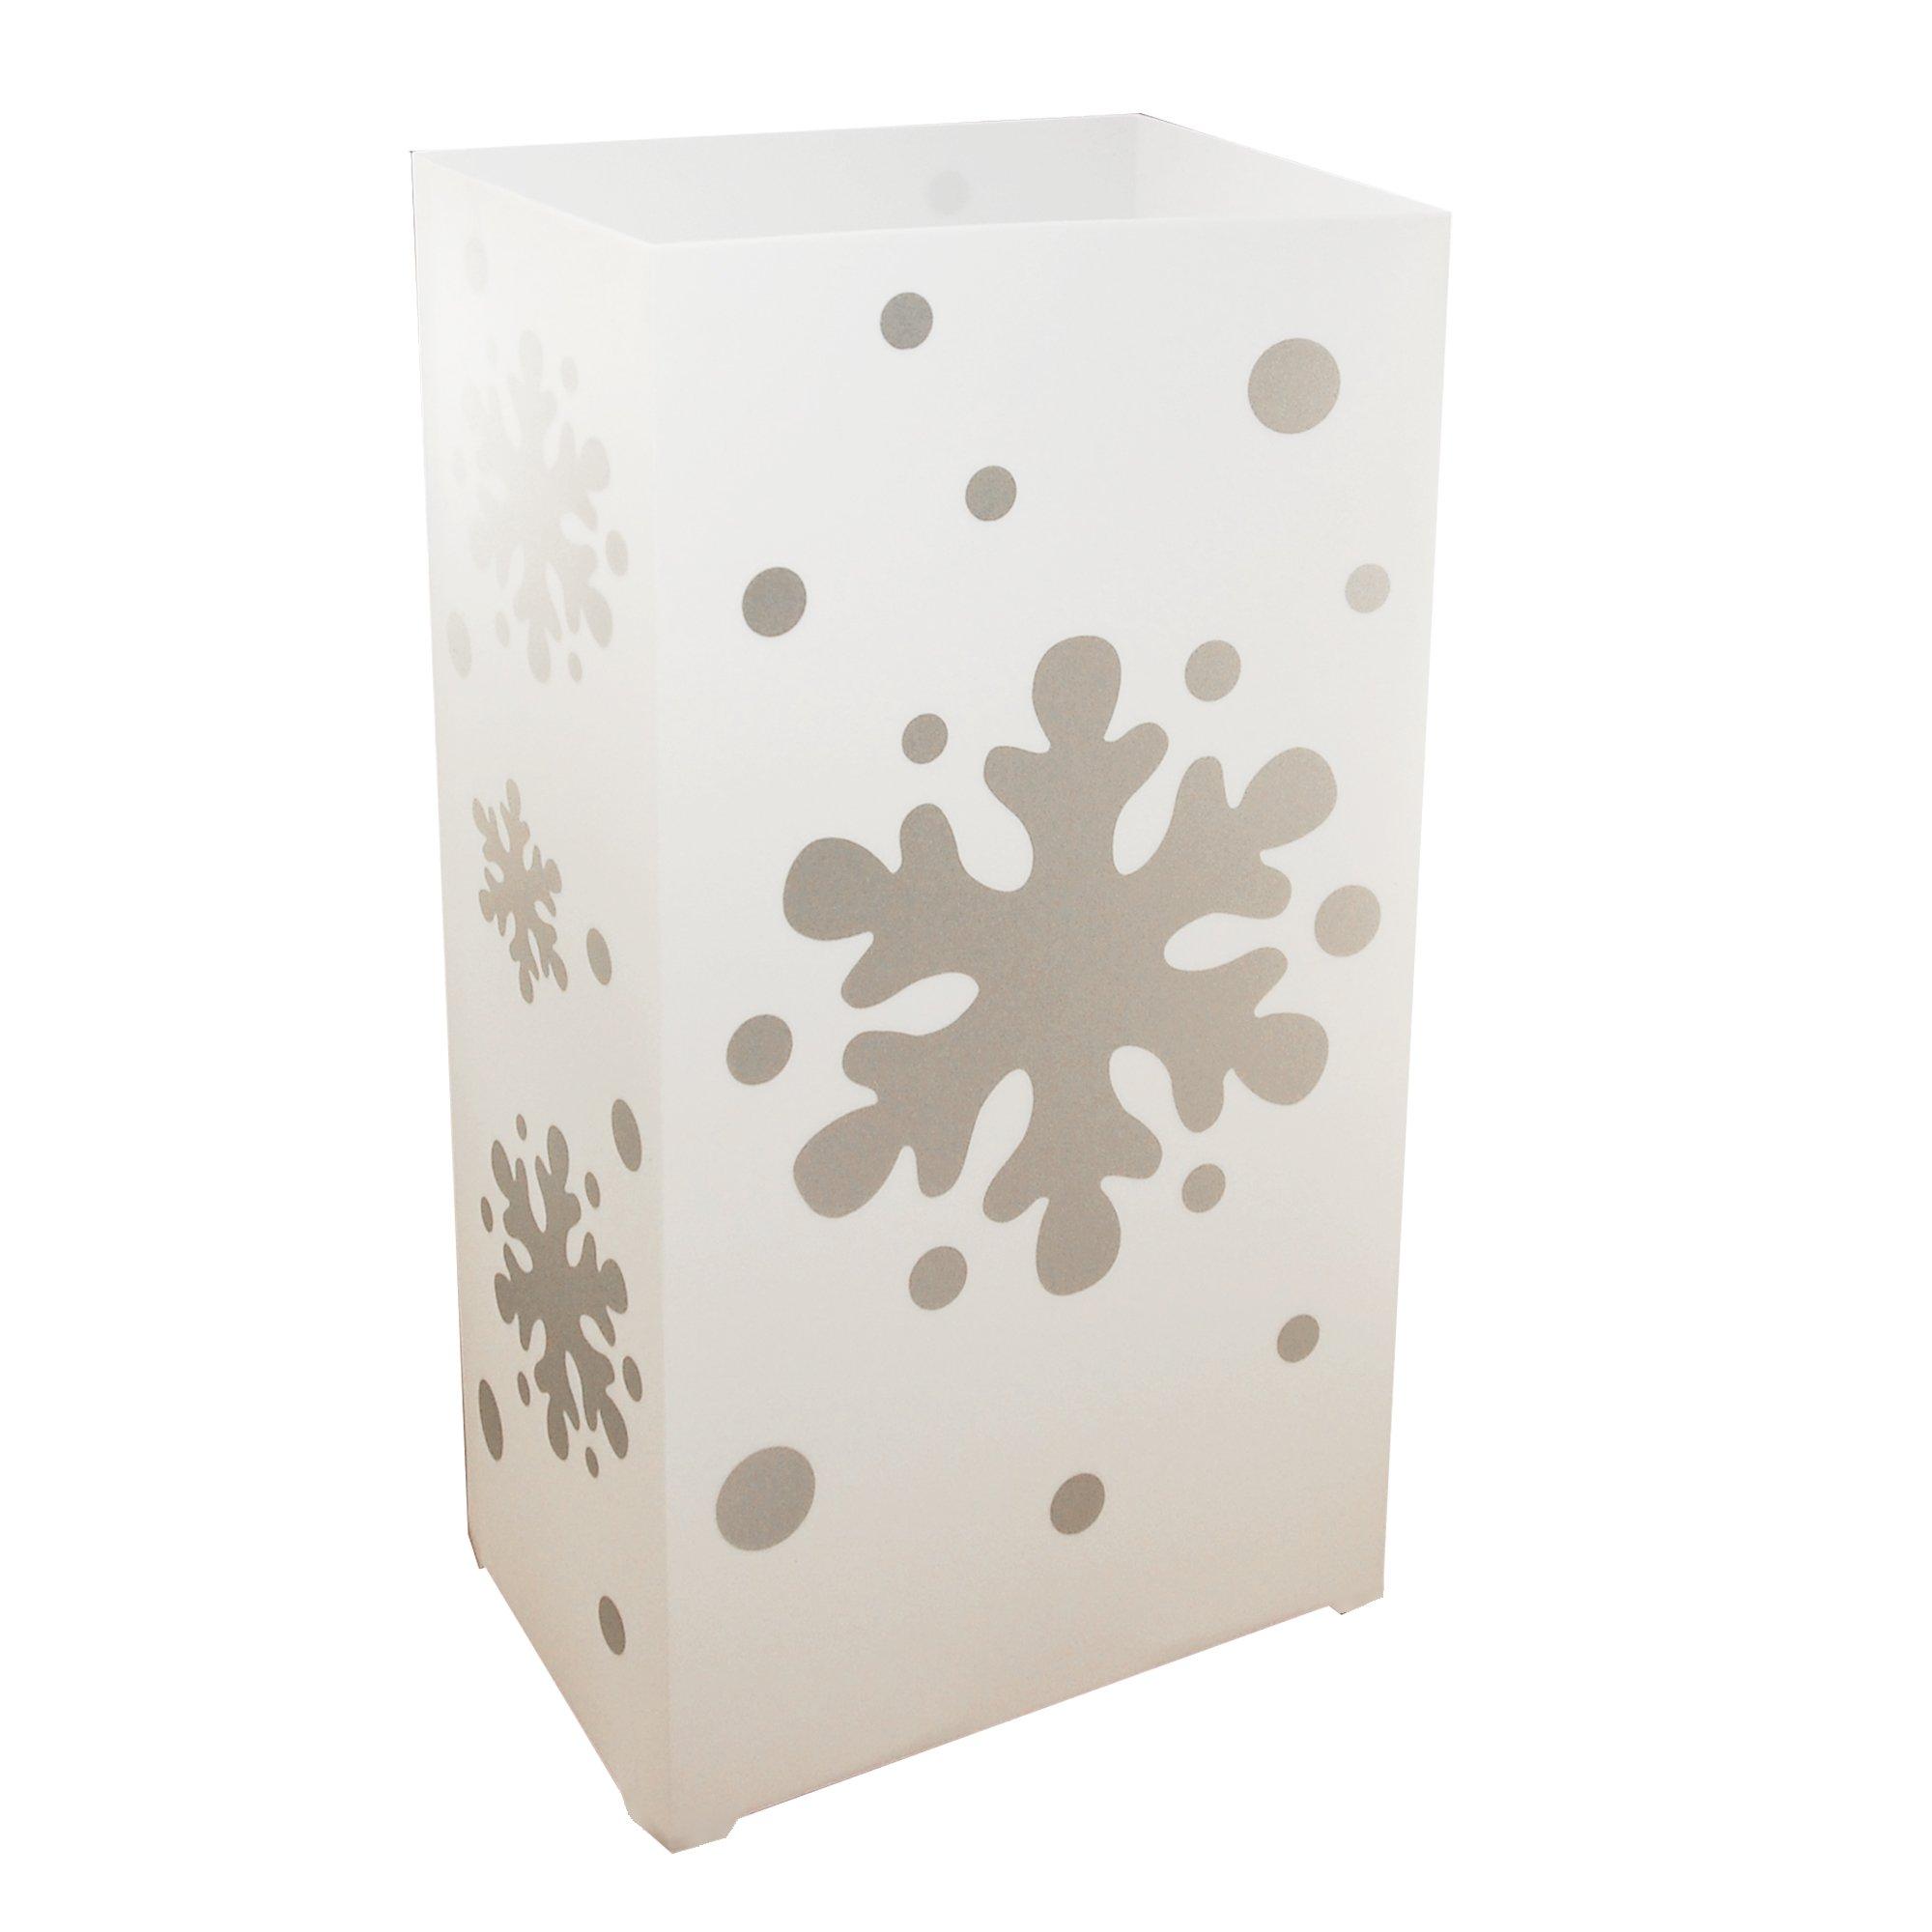 Lumabase 32712 10 Count Snowflake Plastic Lanterns, White